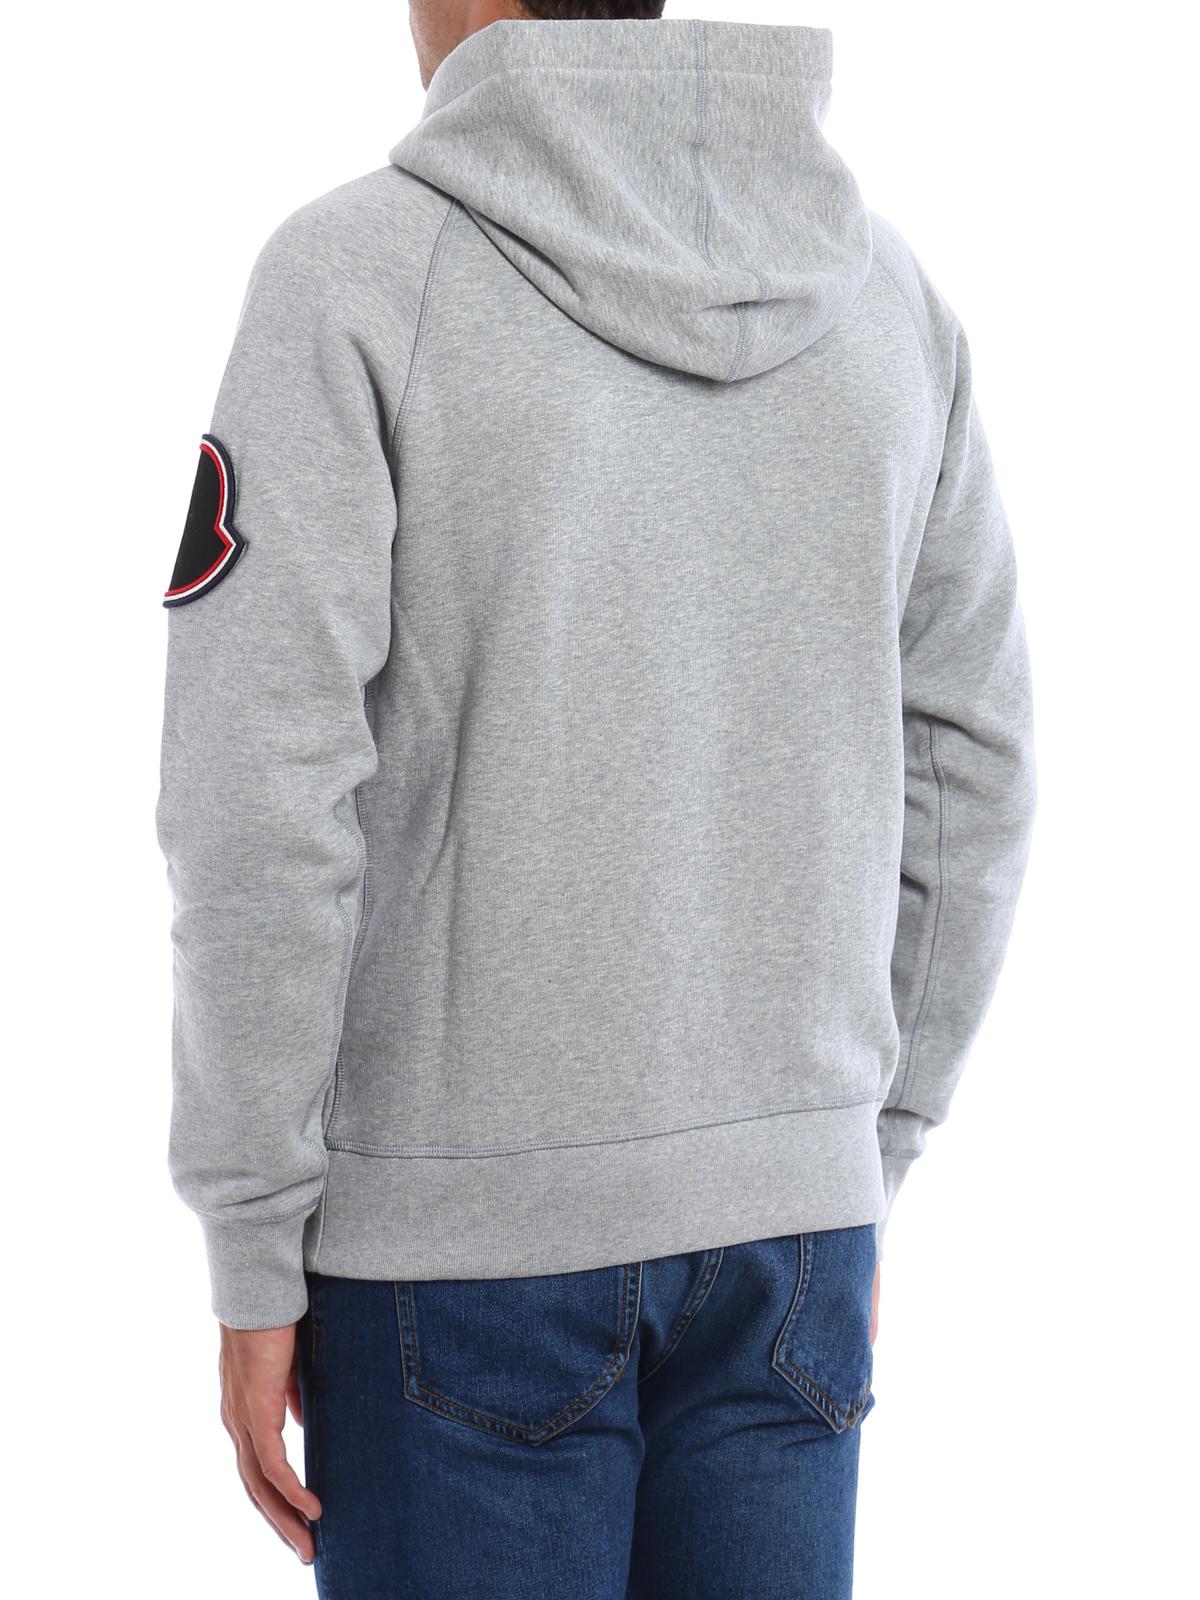 ac4dfb9d5f59 Moncler - Logo patch cotton hoodie - Sweatshirts   Sweaters - C2 091 ...